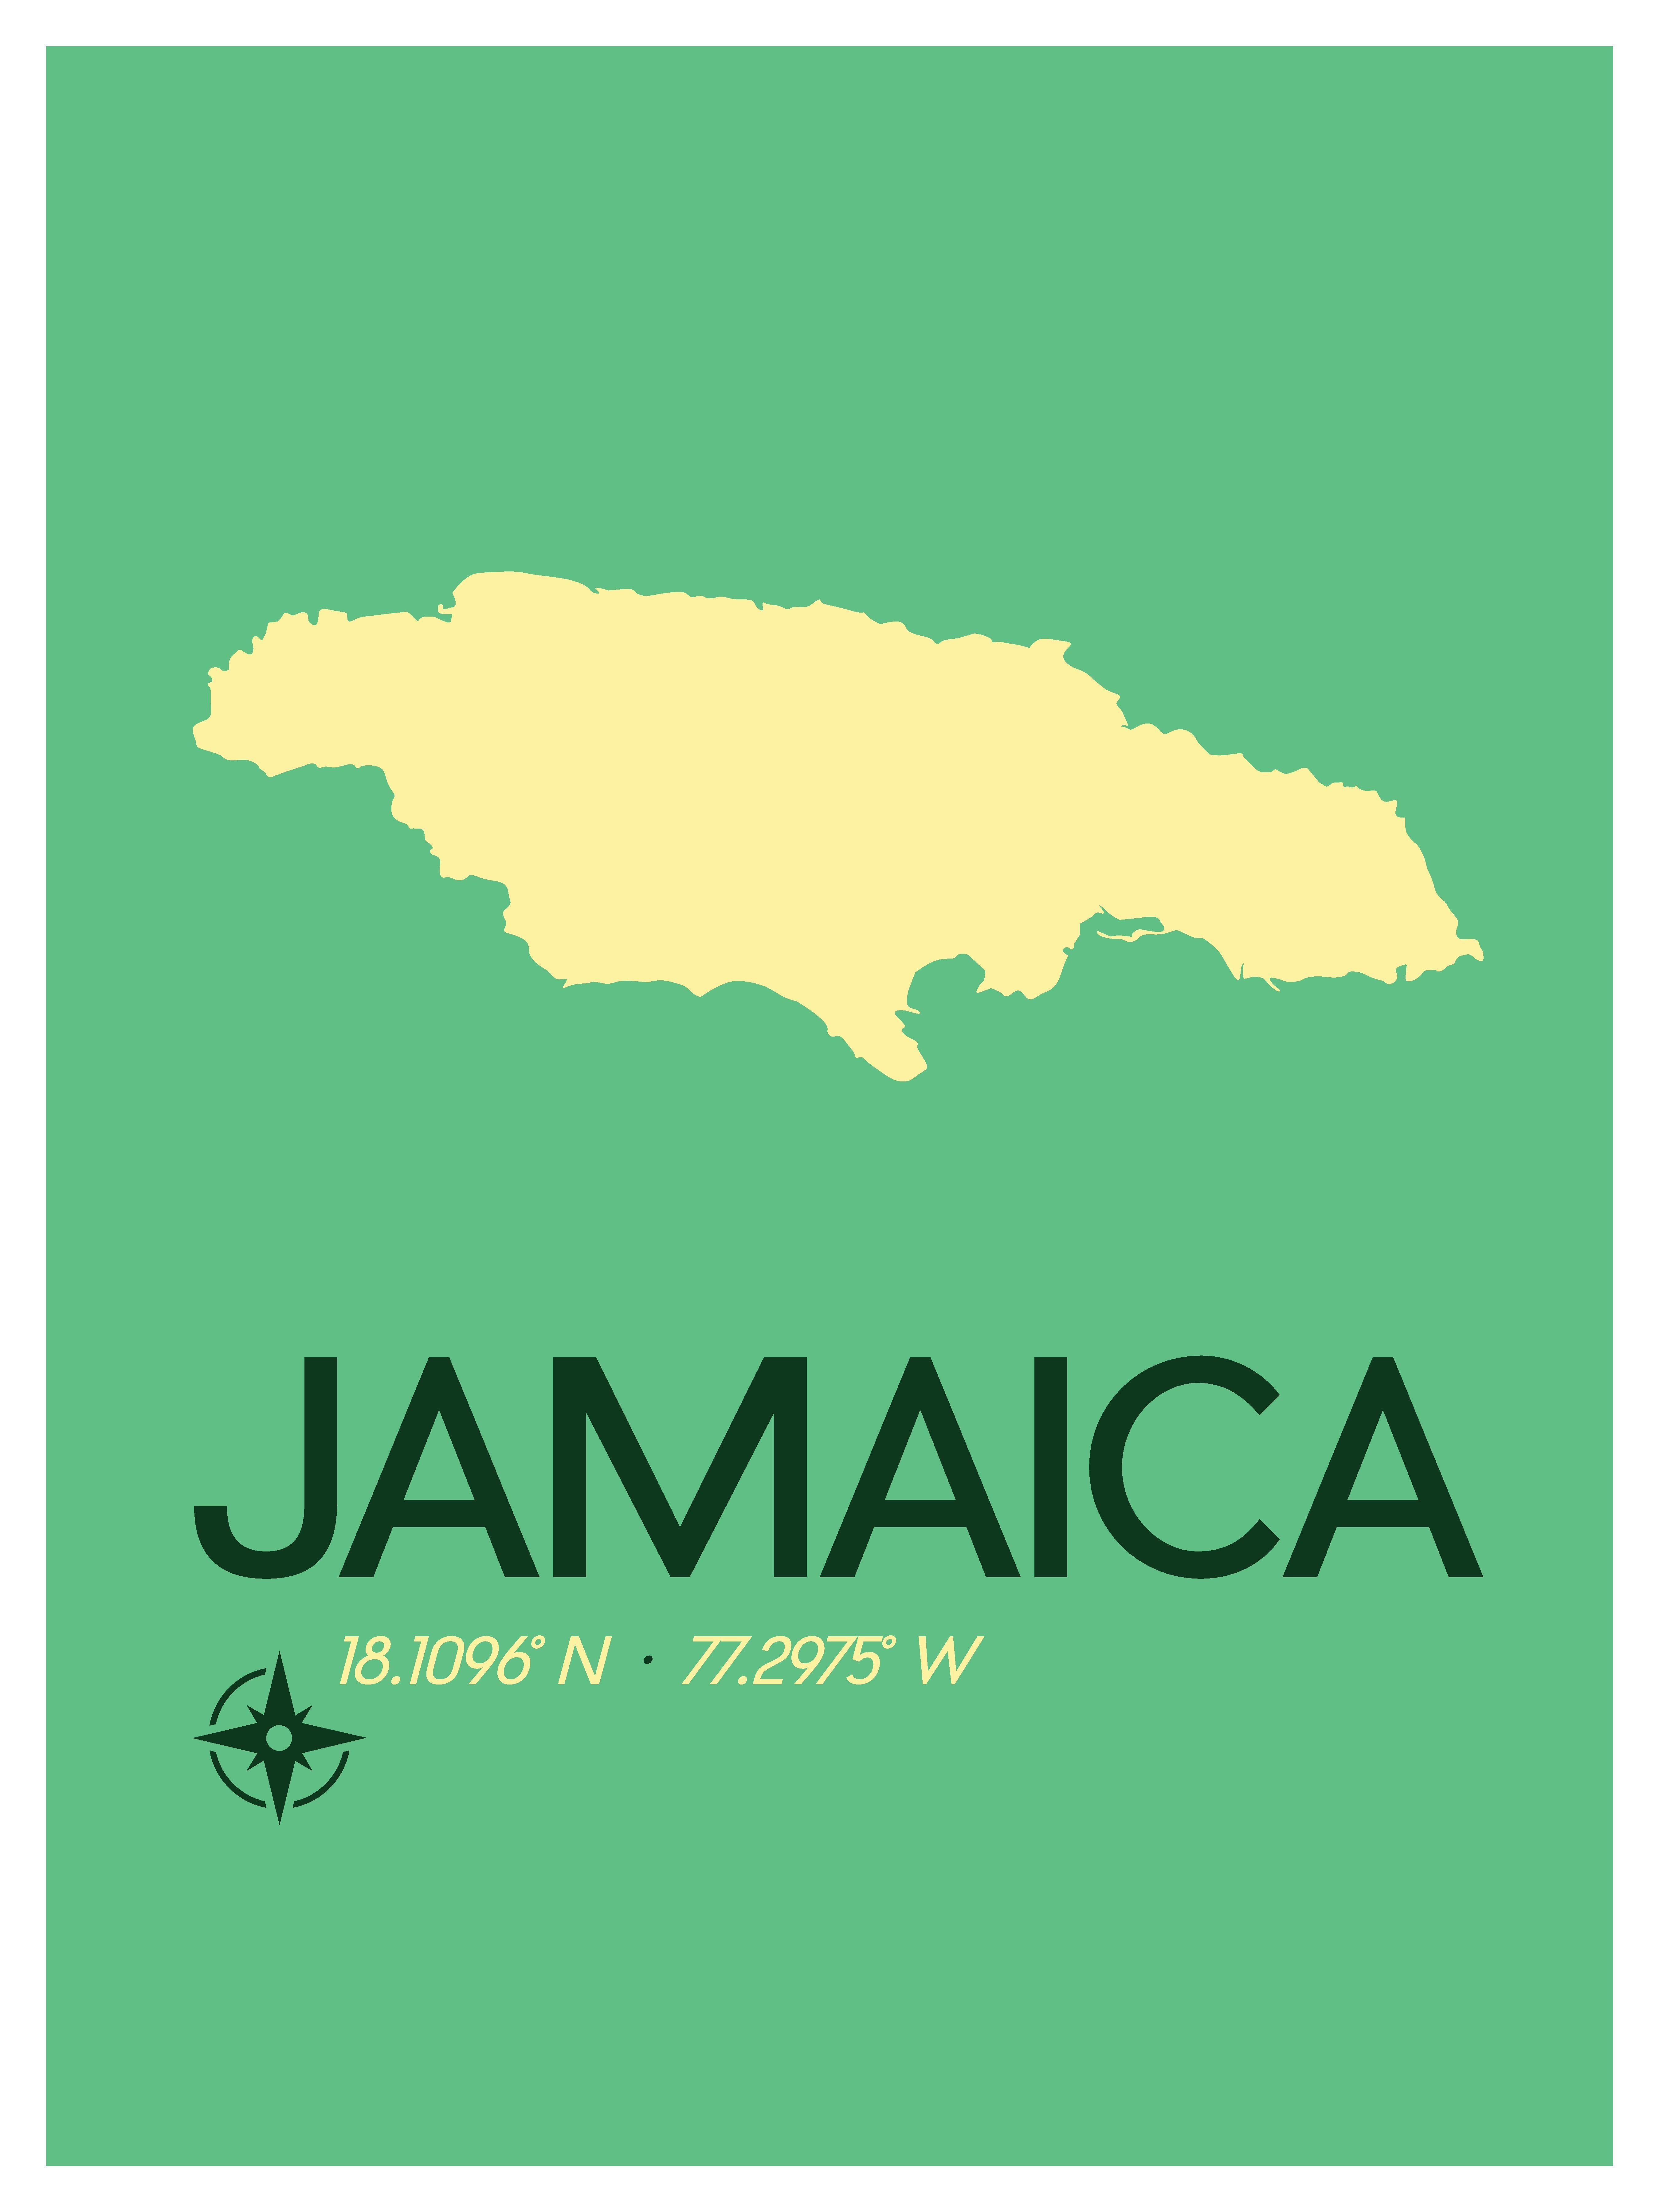 Jamaica Map Travel Poster Jamaican Art Print Caribbean Etsy Travel Artwork Jamaica Map Travel Posters